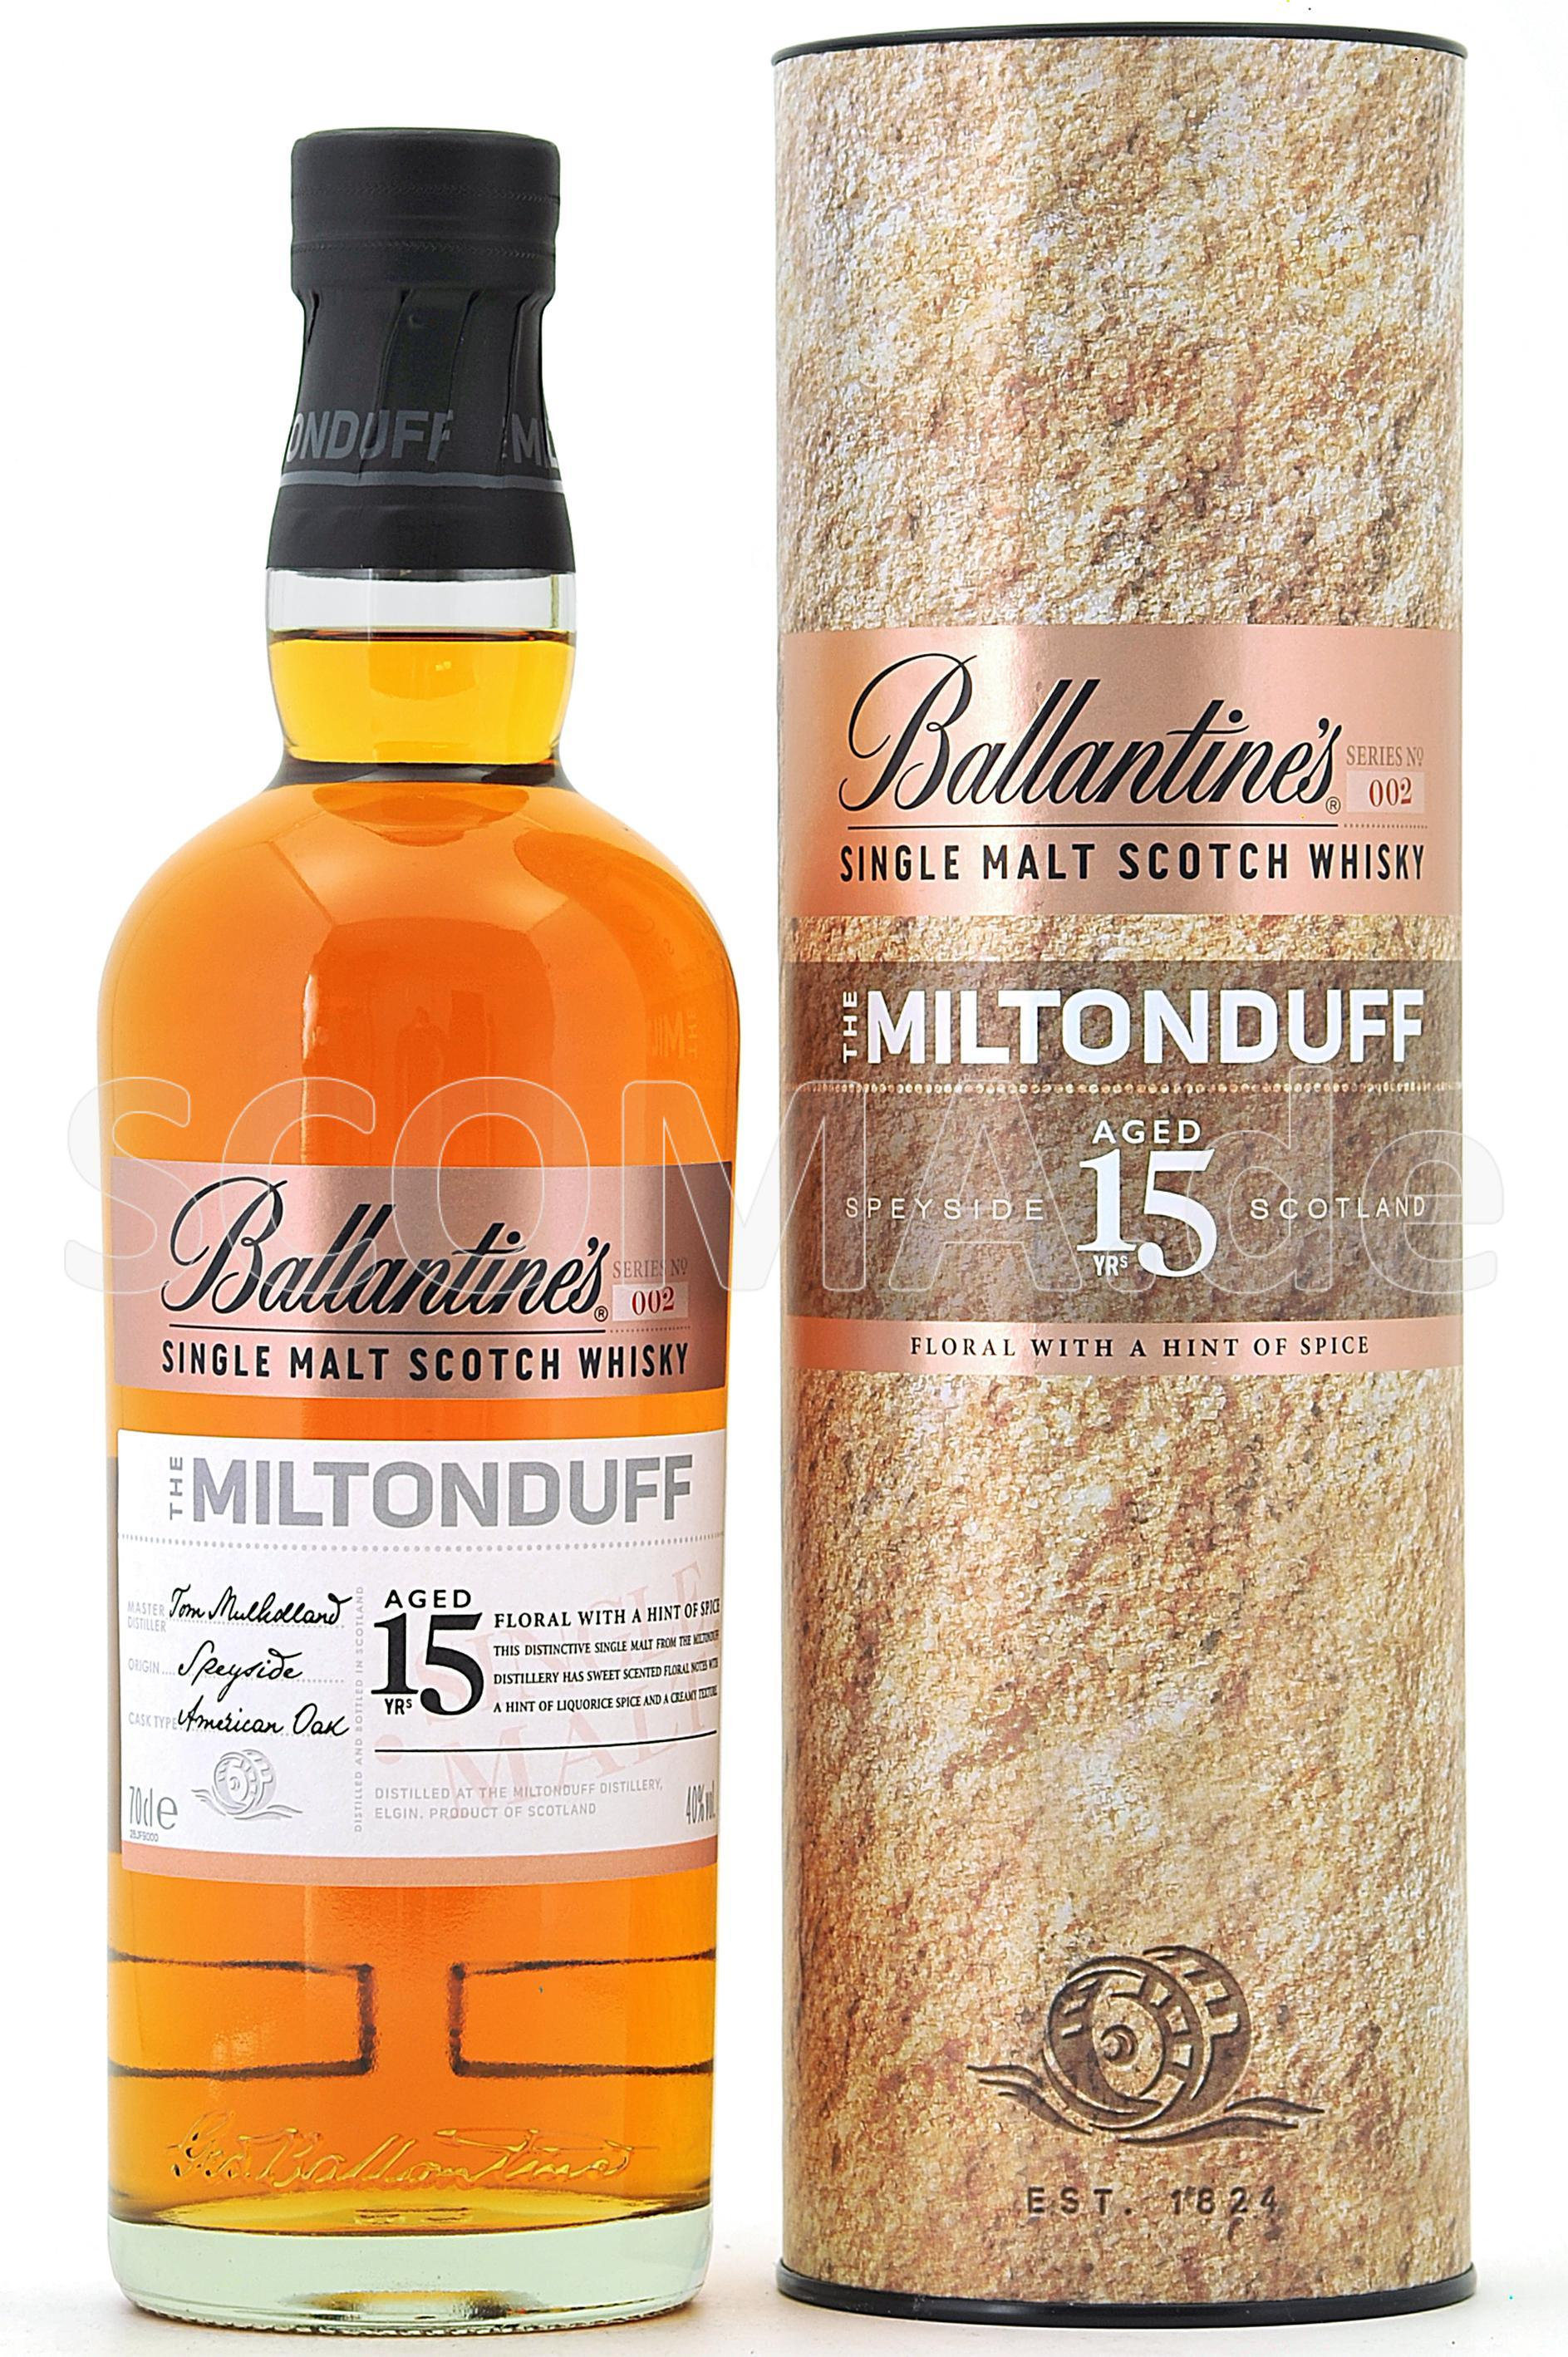 Miltonduff Ballantines 15 Jahr...